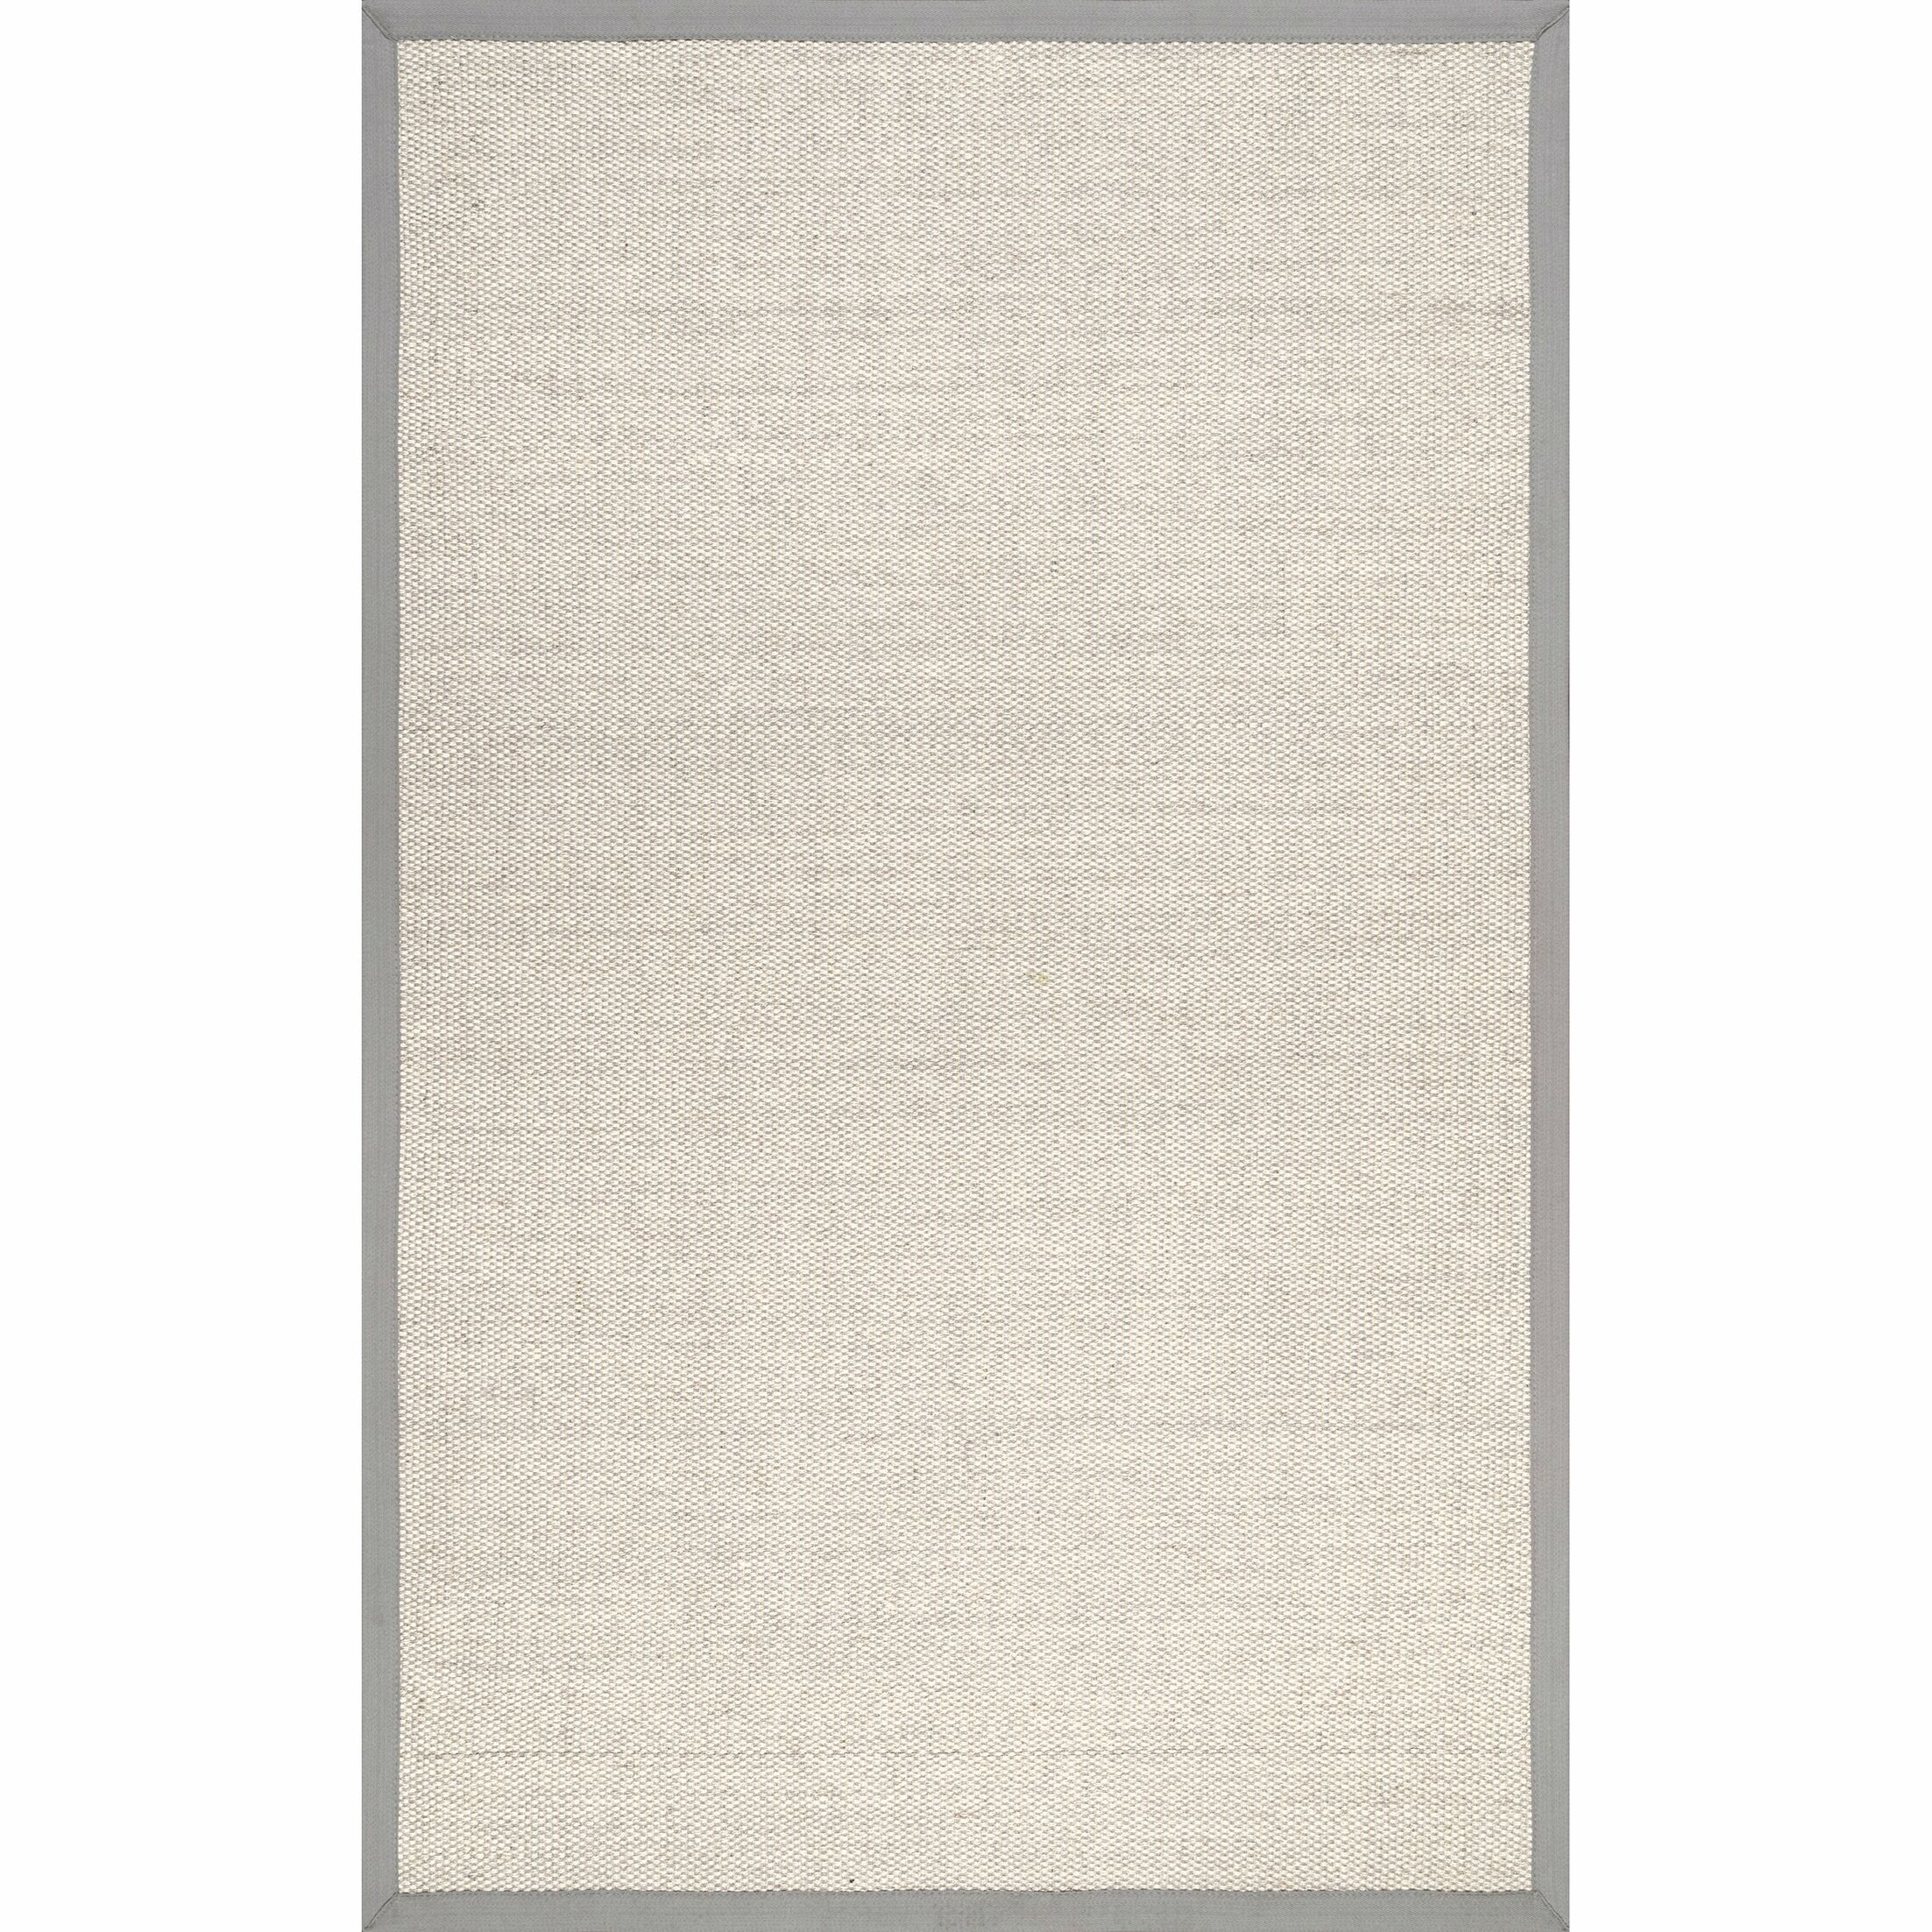 Alvardo Gray Area Rug Rug Size: Rectangle 6' x 9'